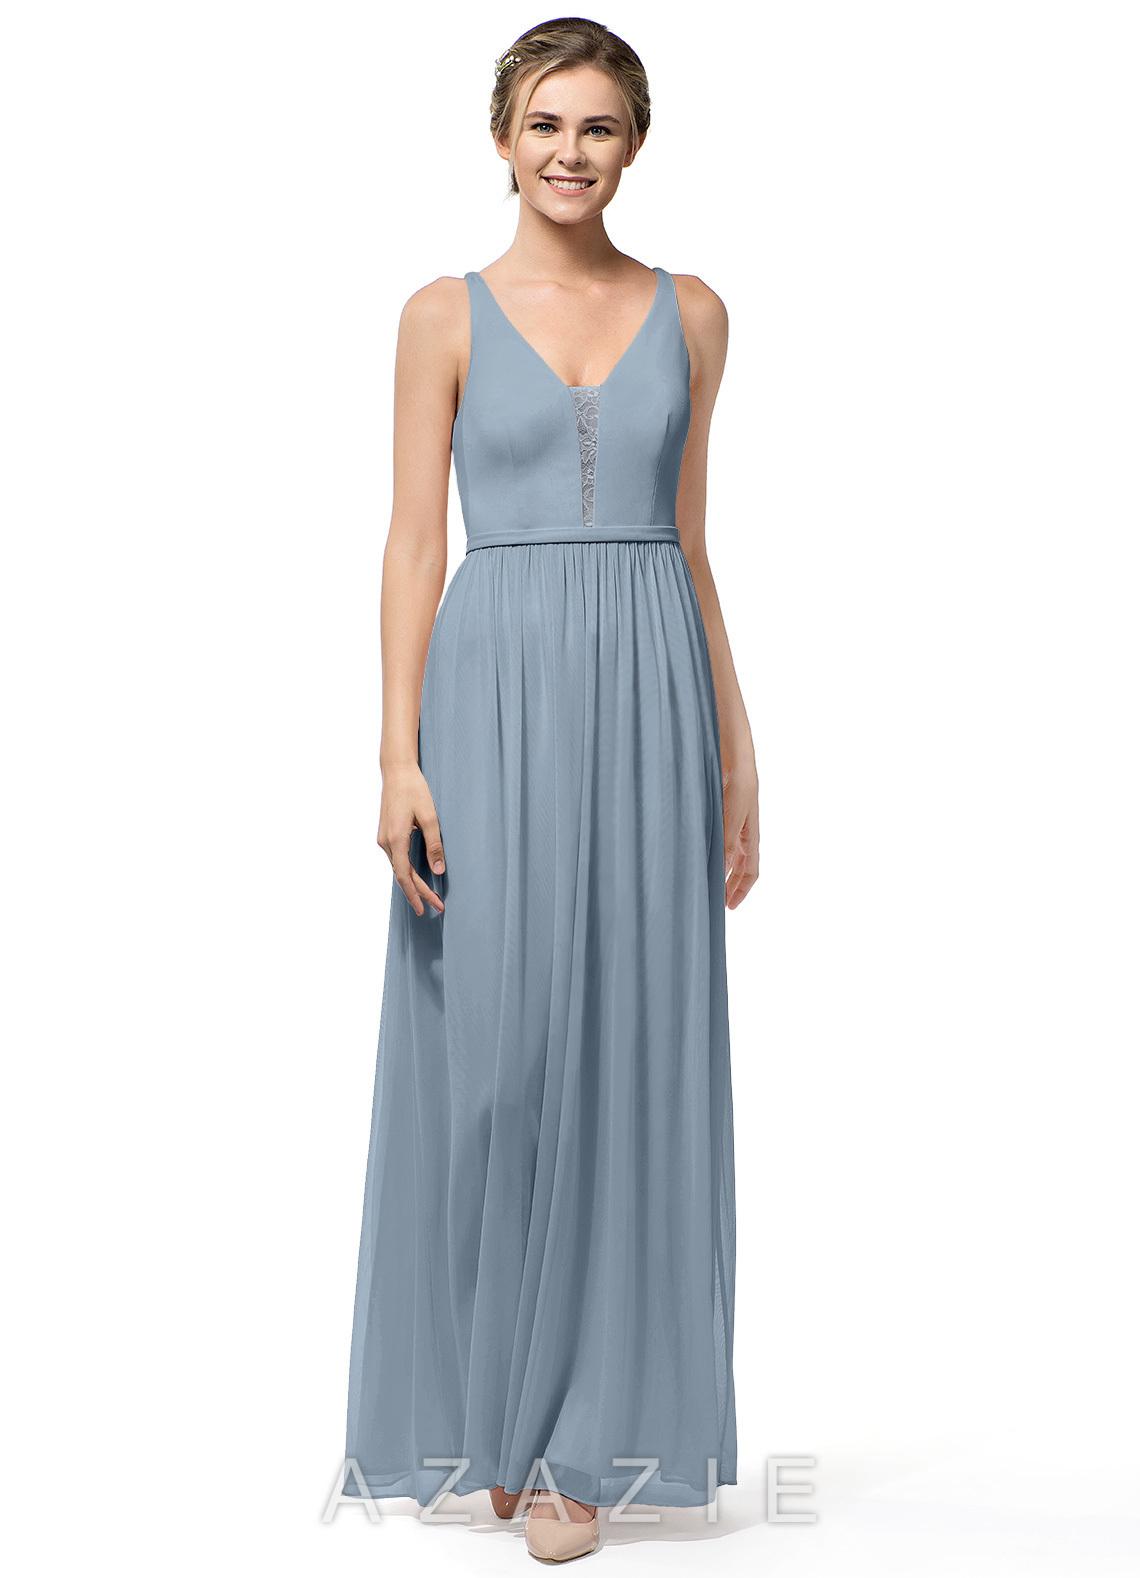 f7a7ca2a1d7 Azazie Nova Bridesmaid Dress - Dusty Blue